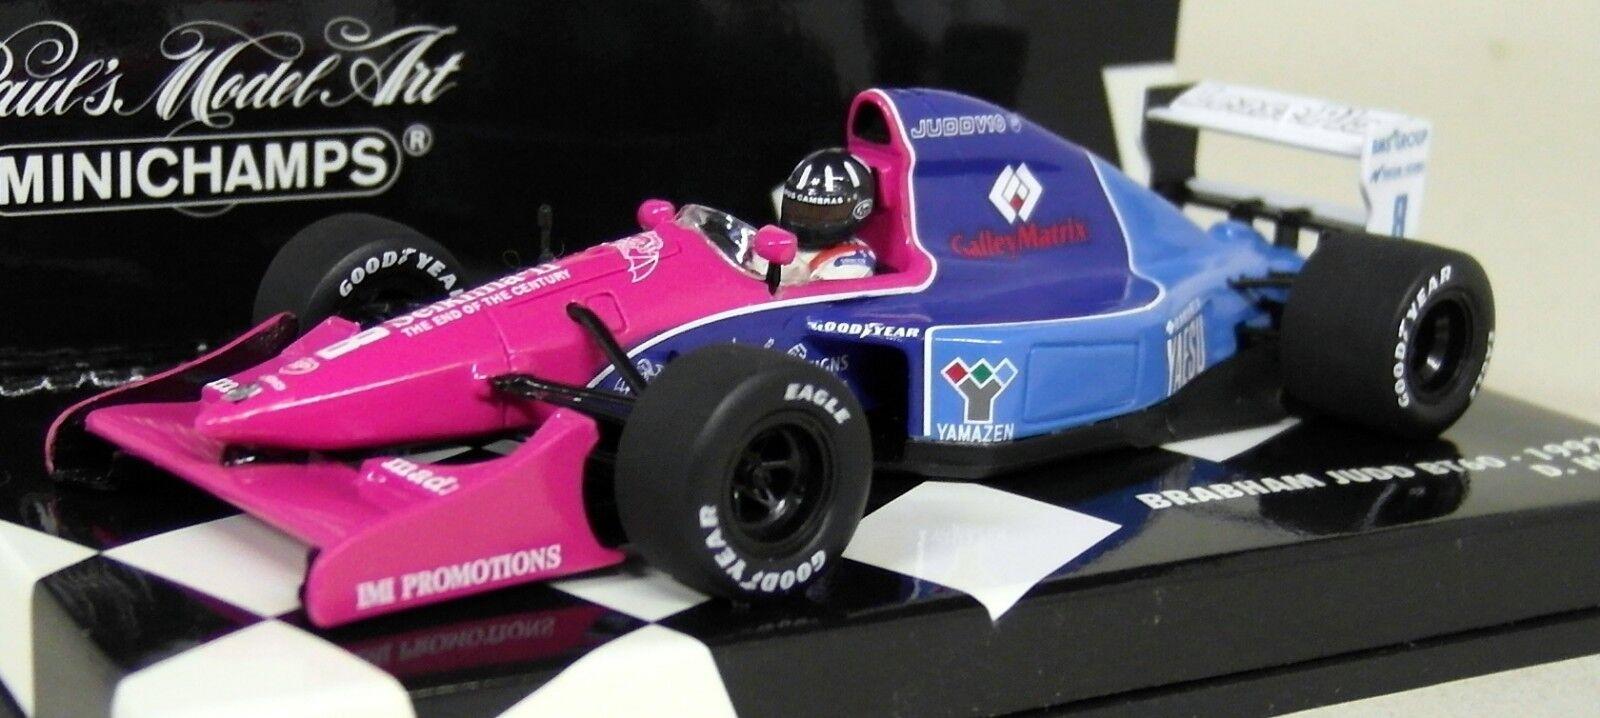 Minichamps 1 43 Scale Scale Scale 430 920007 Brabham Judd BT60 1992 D. Hill Diecast F1 Model b628f2